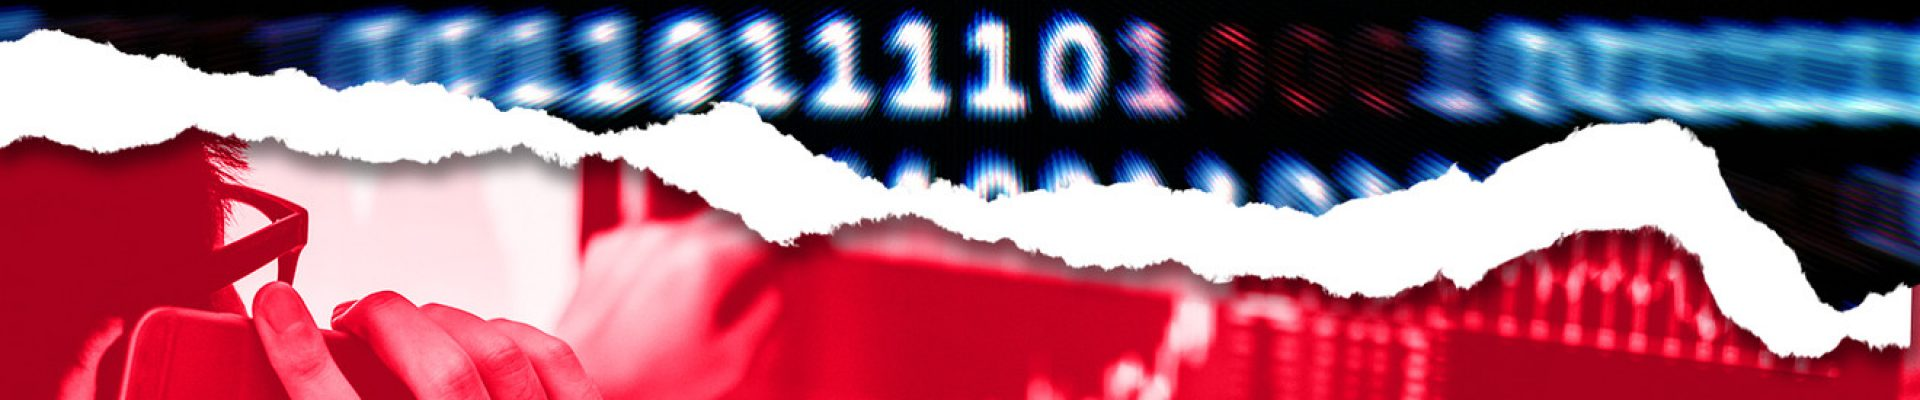 MW-IA774_access_ZG_20200224111445.jpg